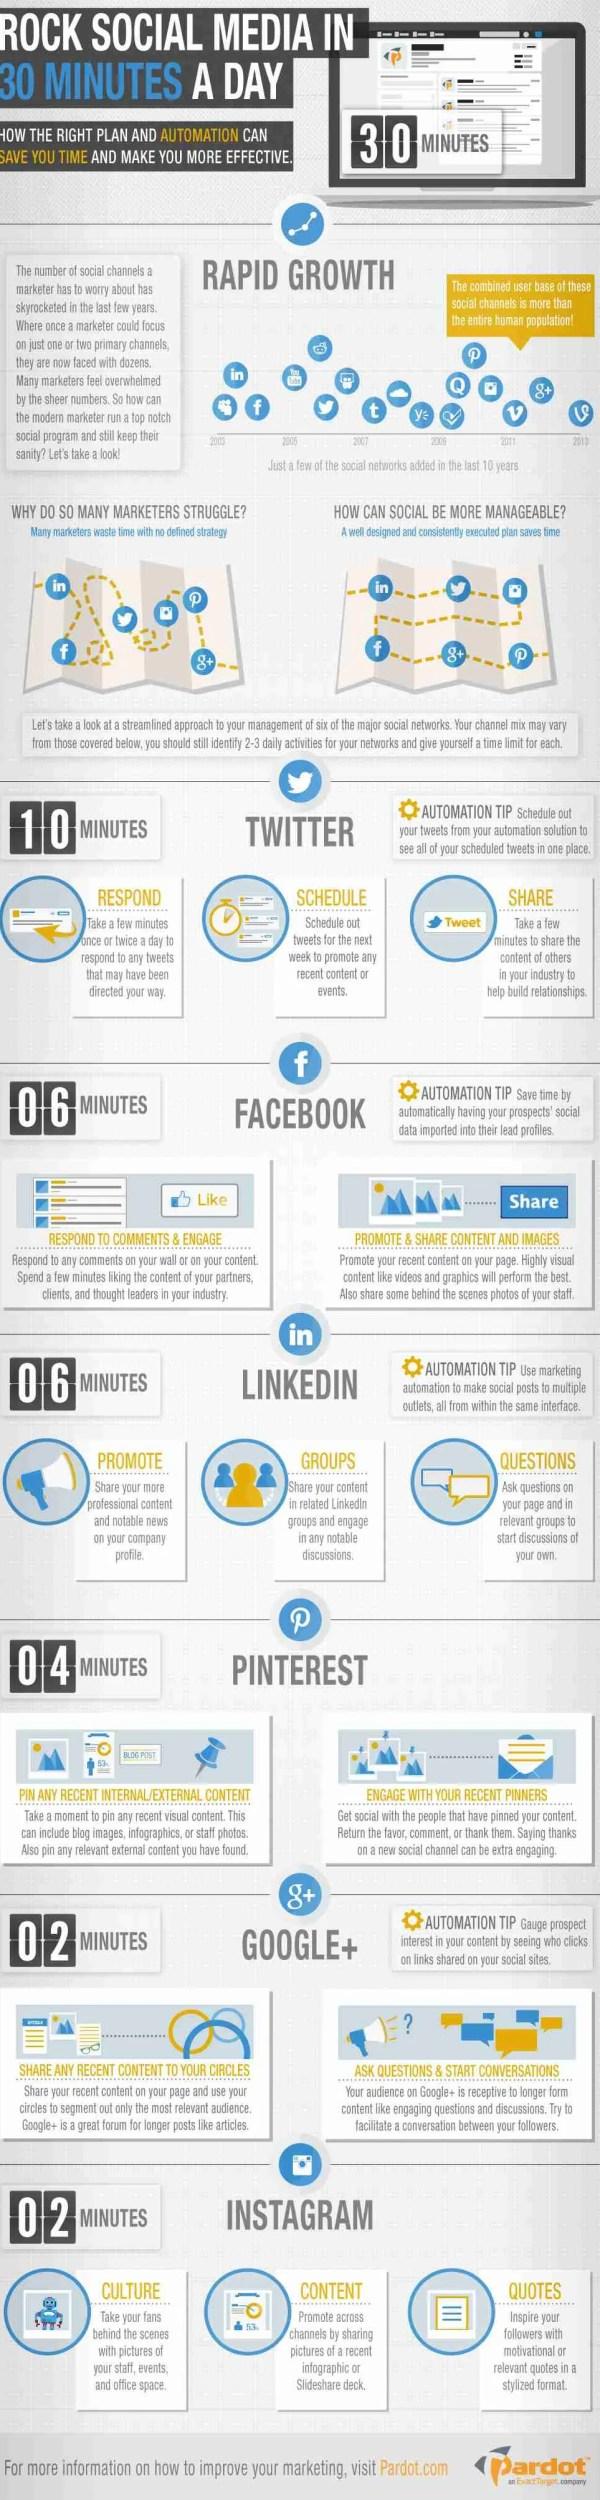 rock-social-media-infographic